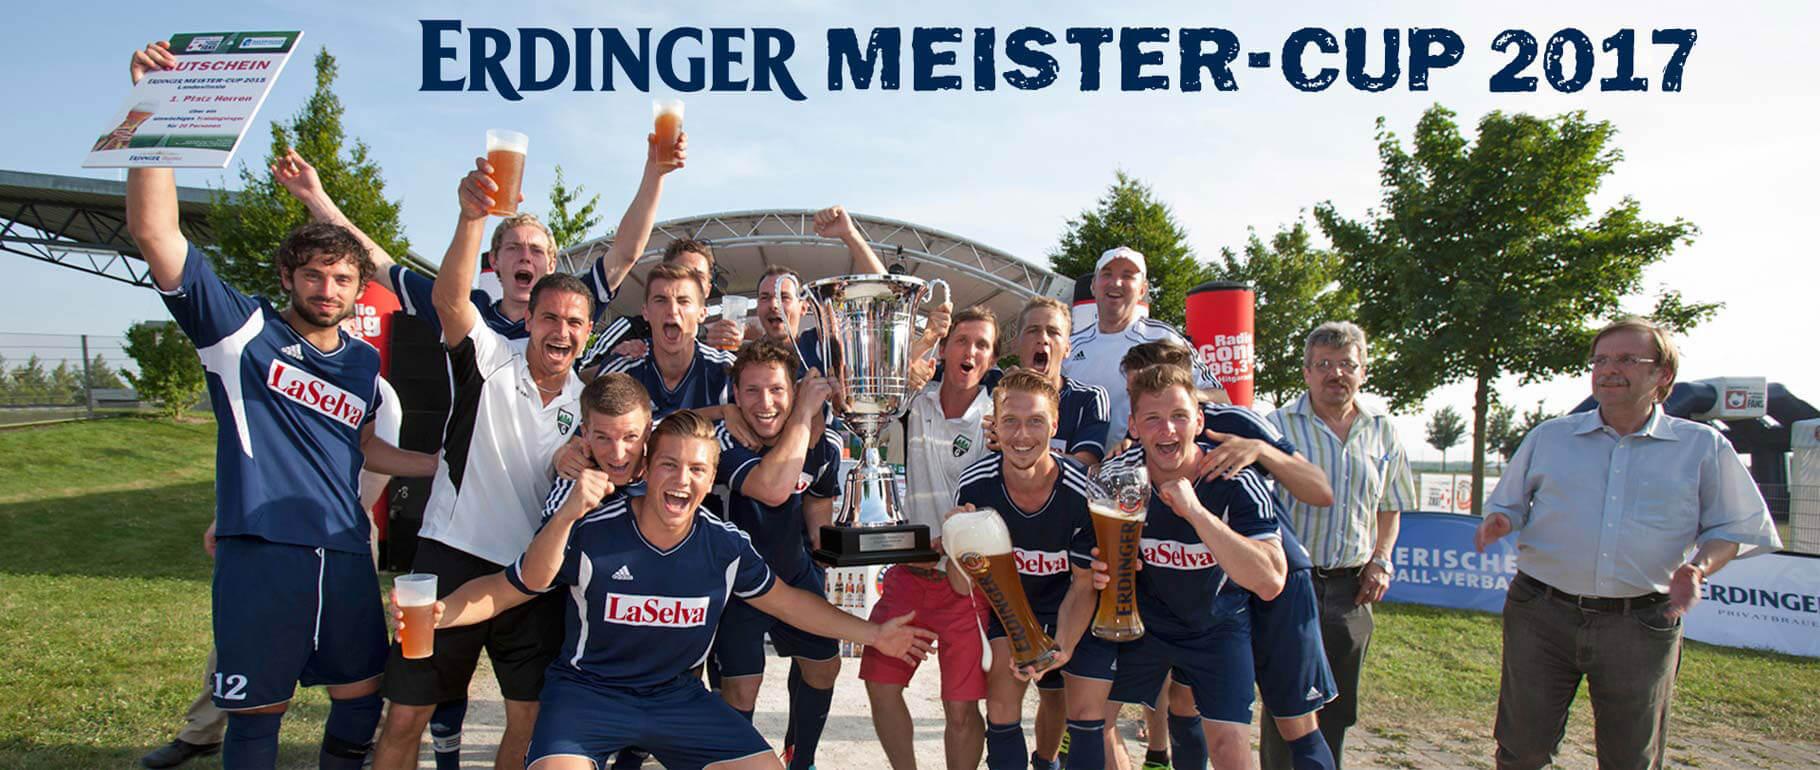 ERDINGER Meister-Cup 2017